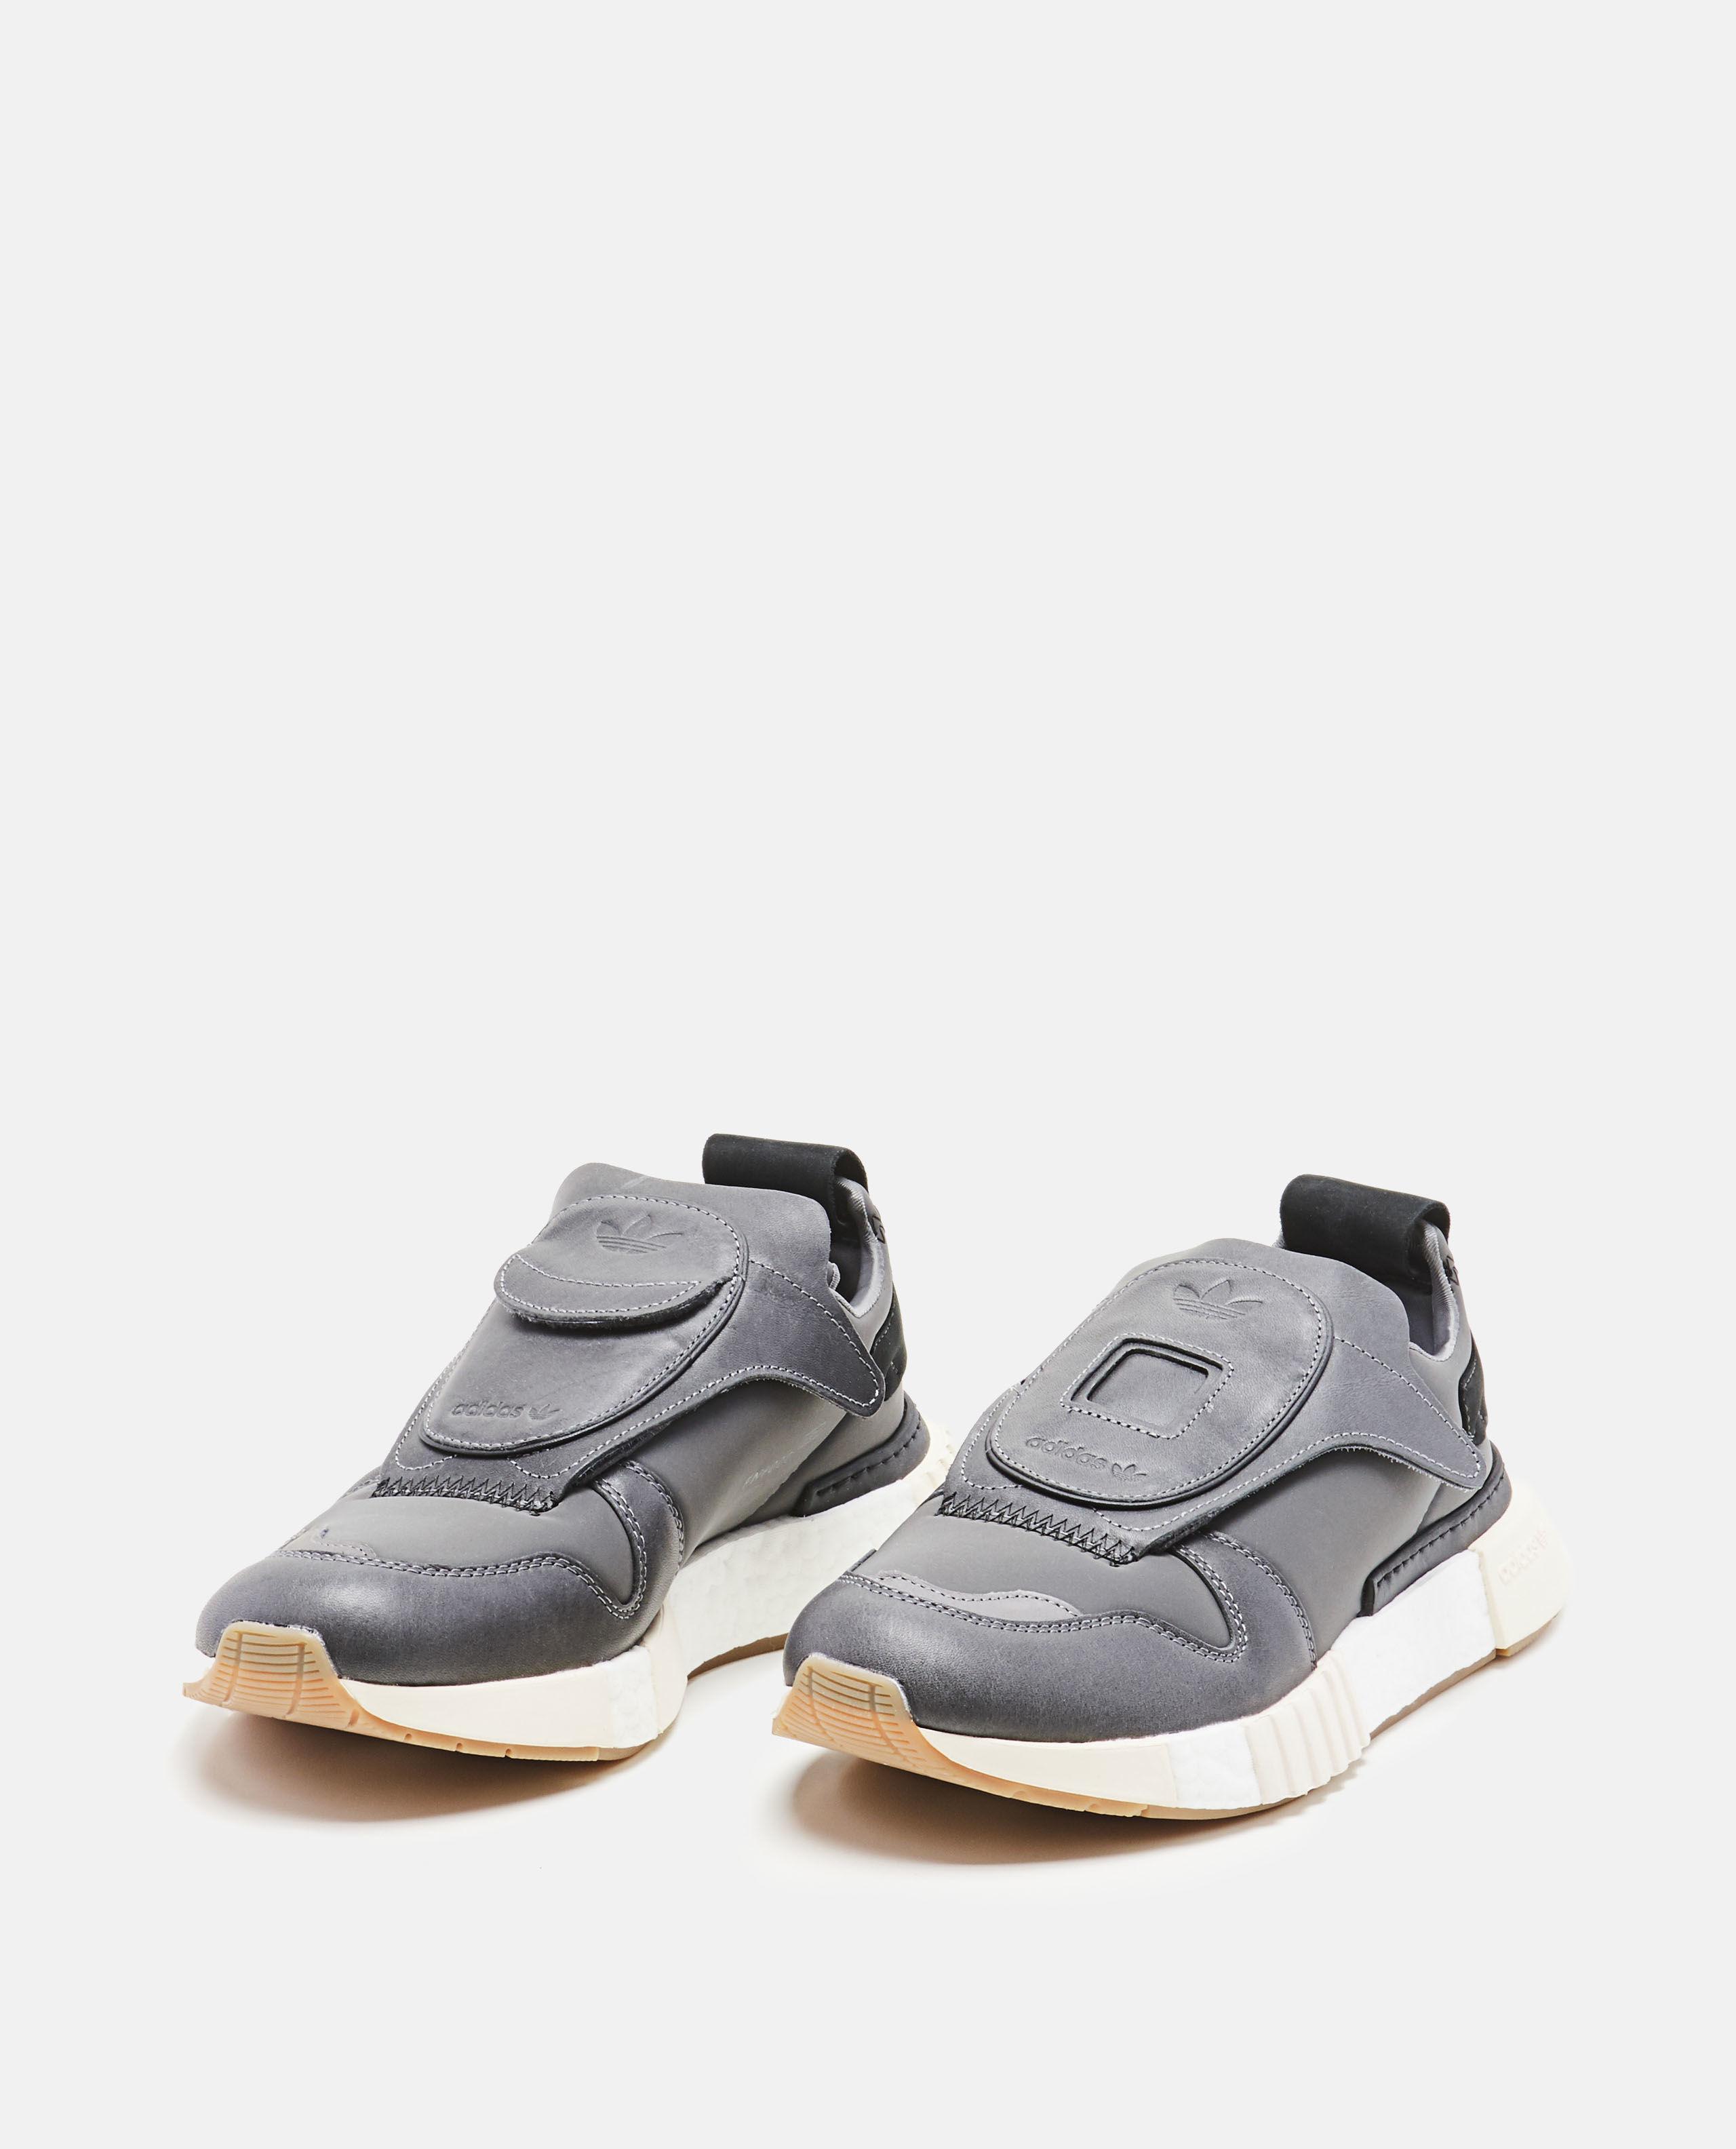 826dccb4e763e adidas Originals Futurepacer Sneaker in Gray for Men - Lyst